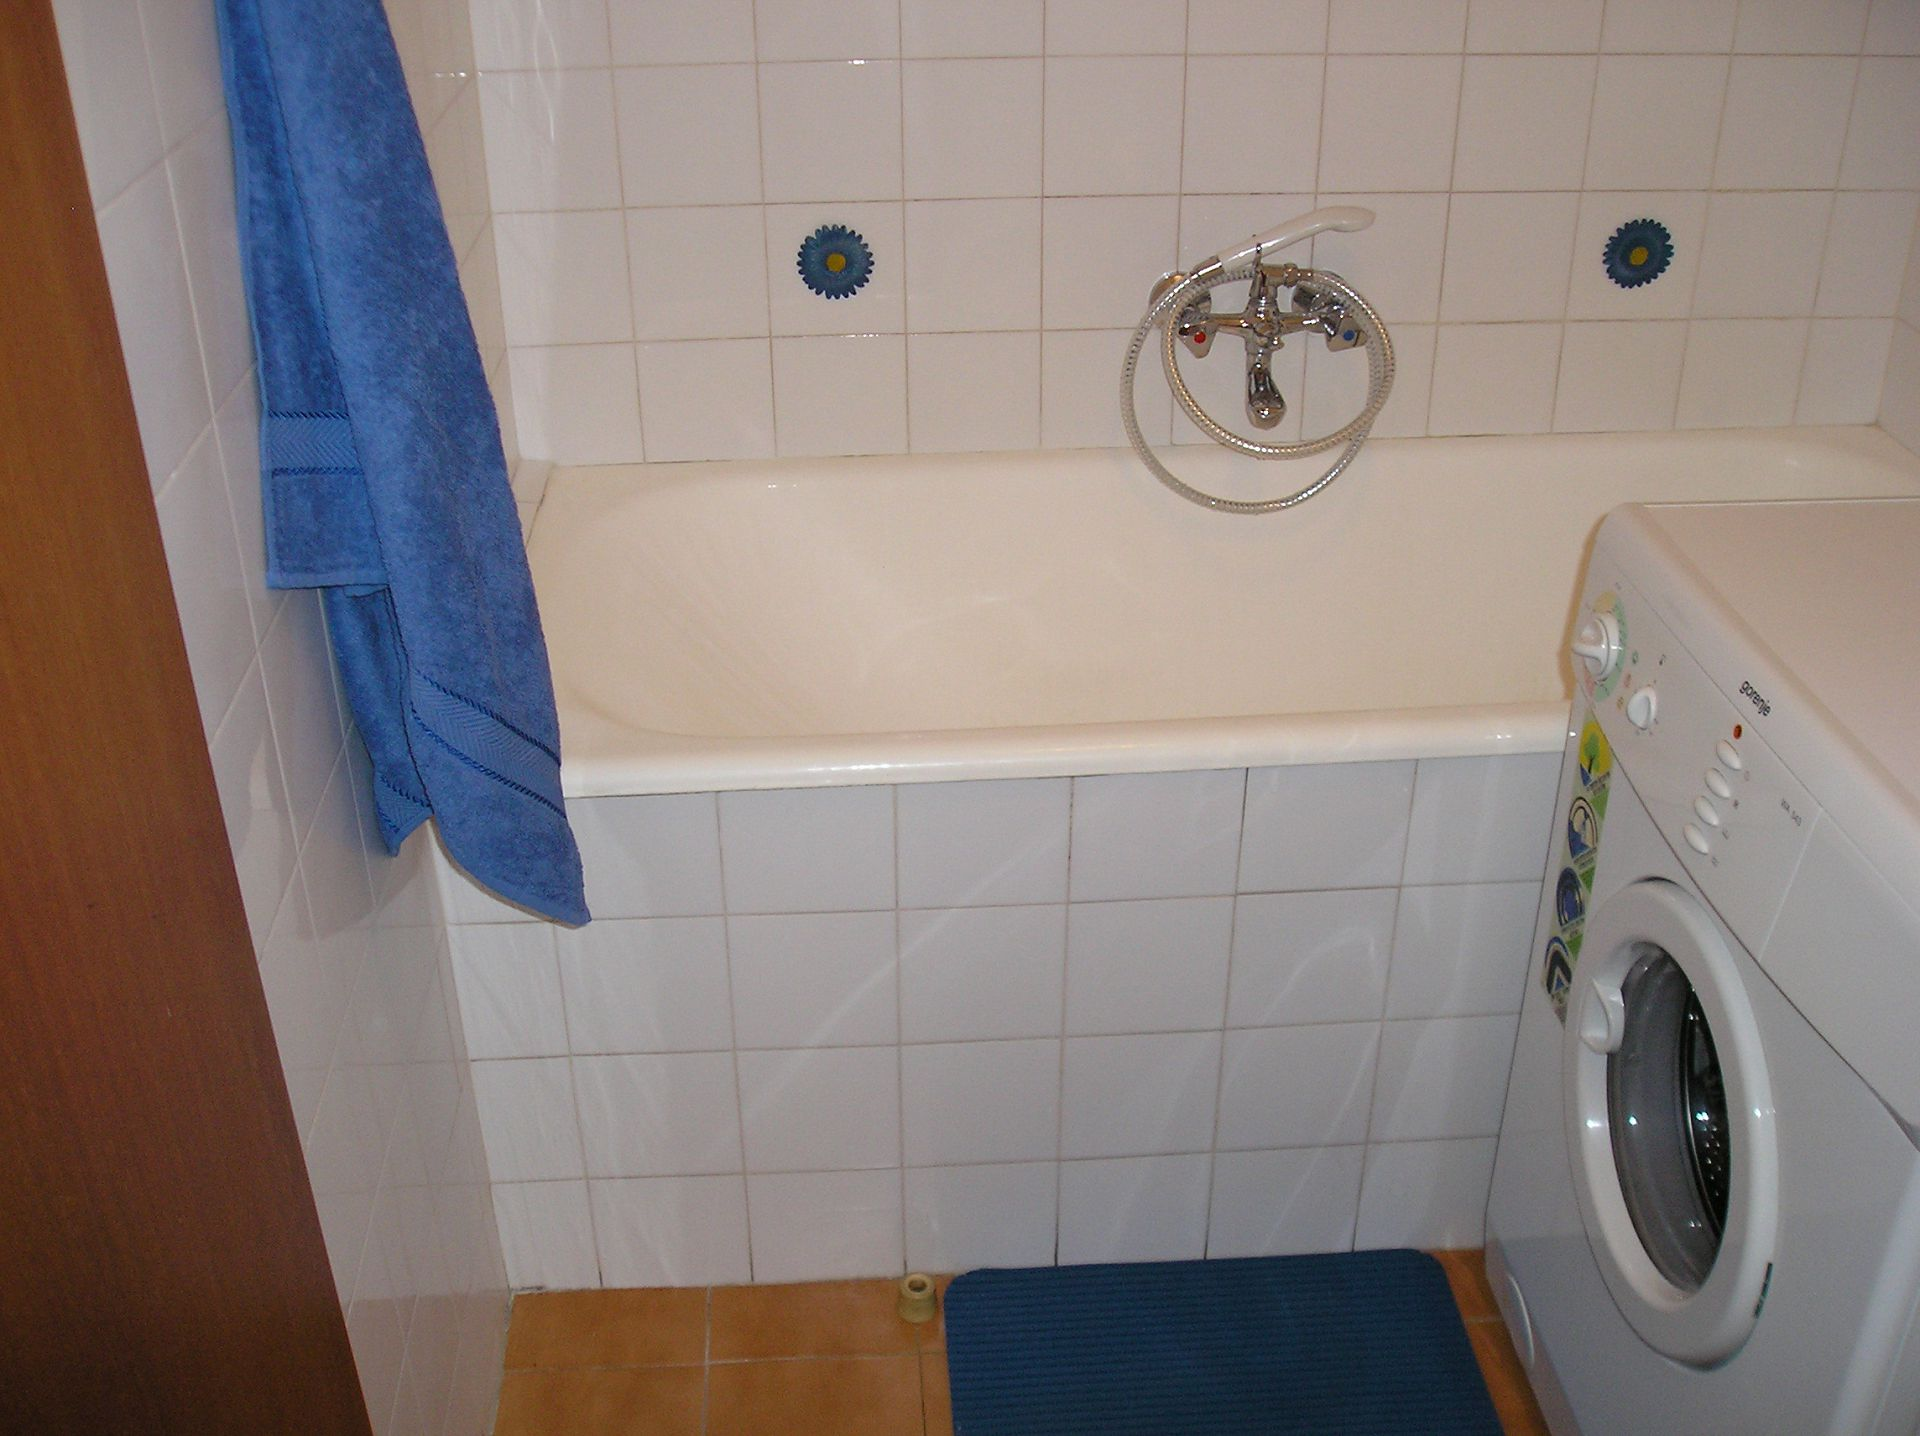 5751 - Lovran - Apartments Croatia - A1(2+2): bathroom with toilet